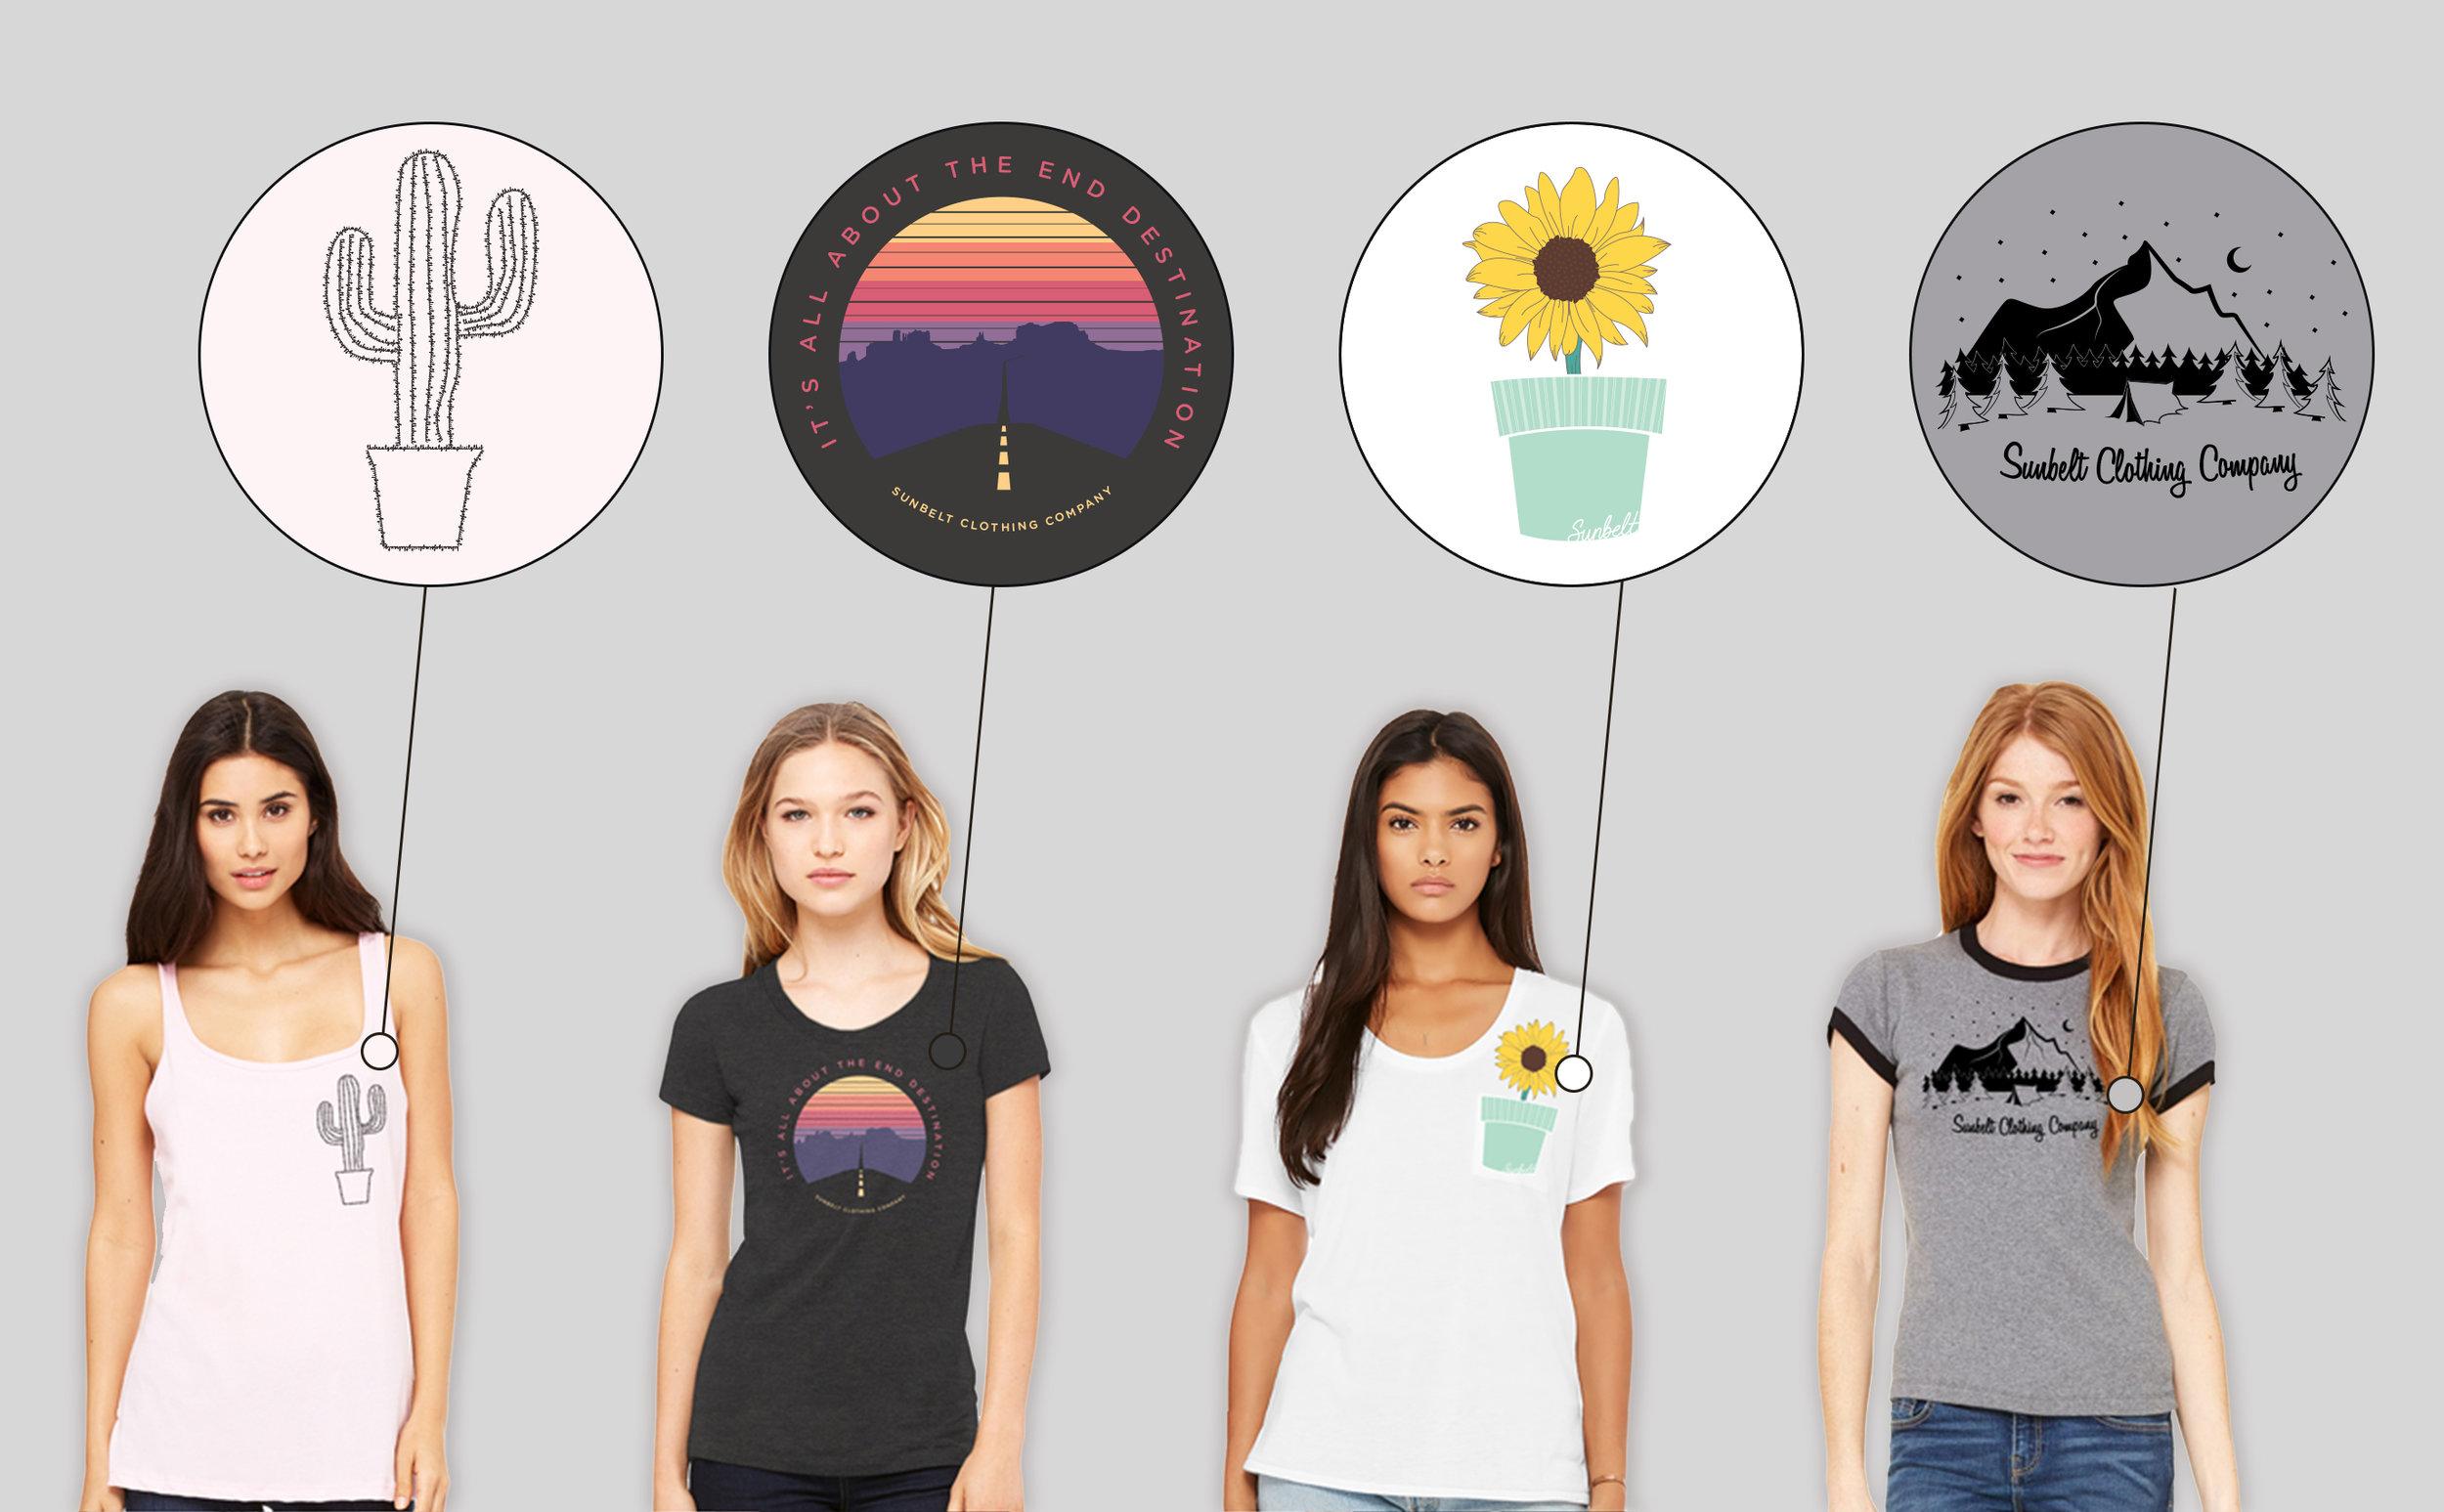 Sunbelt Clothing Shirt Design